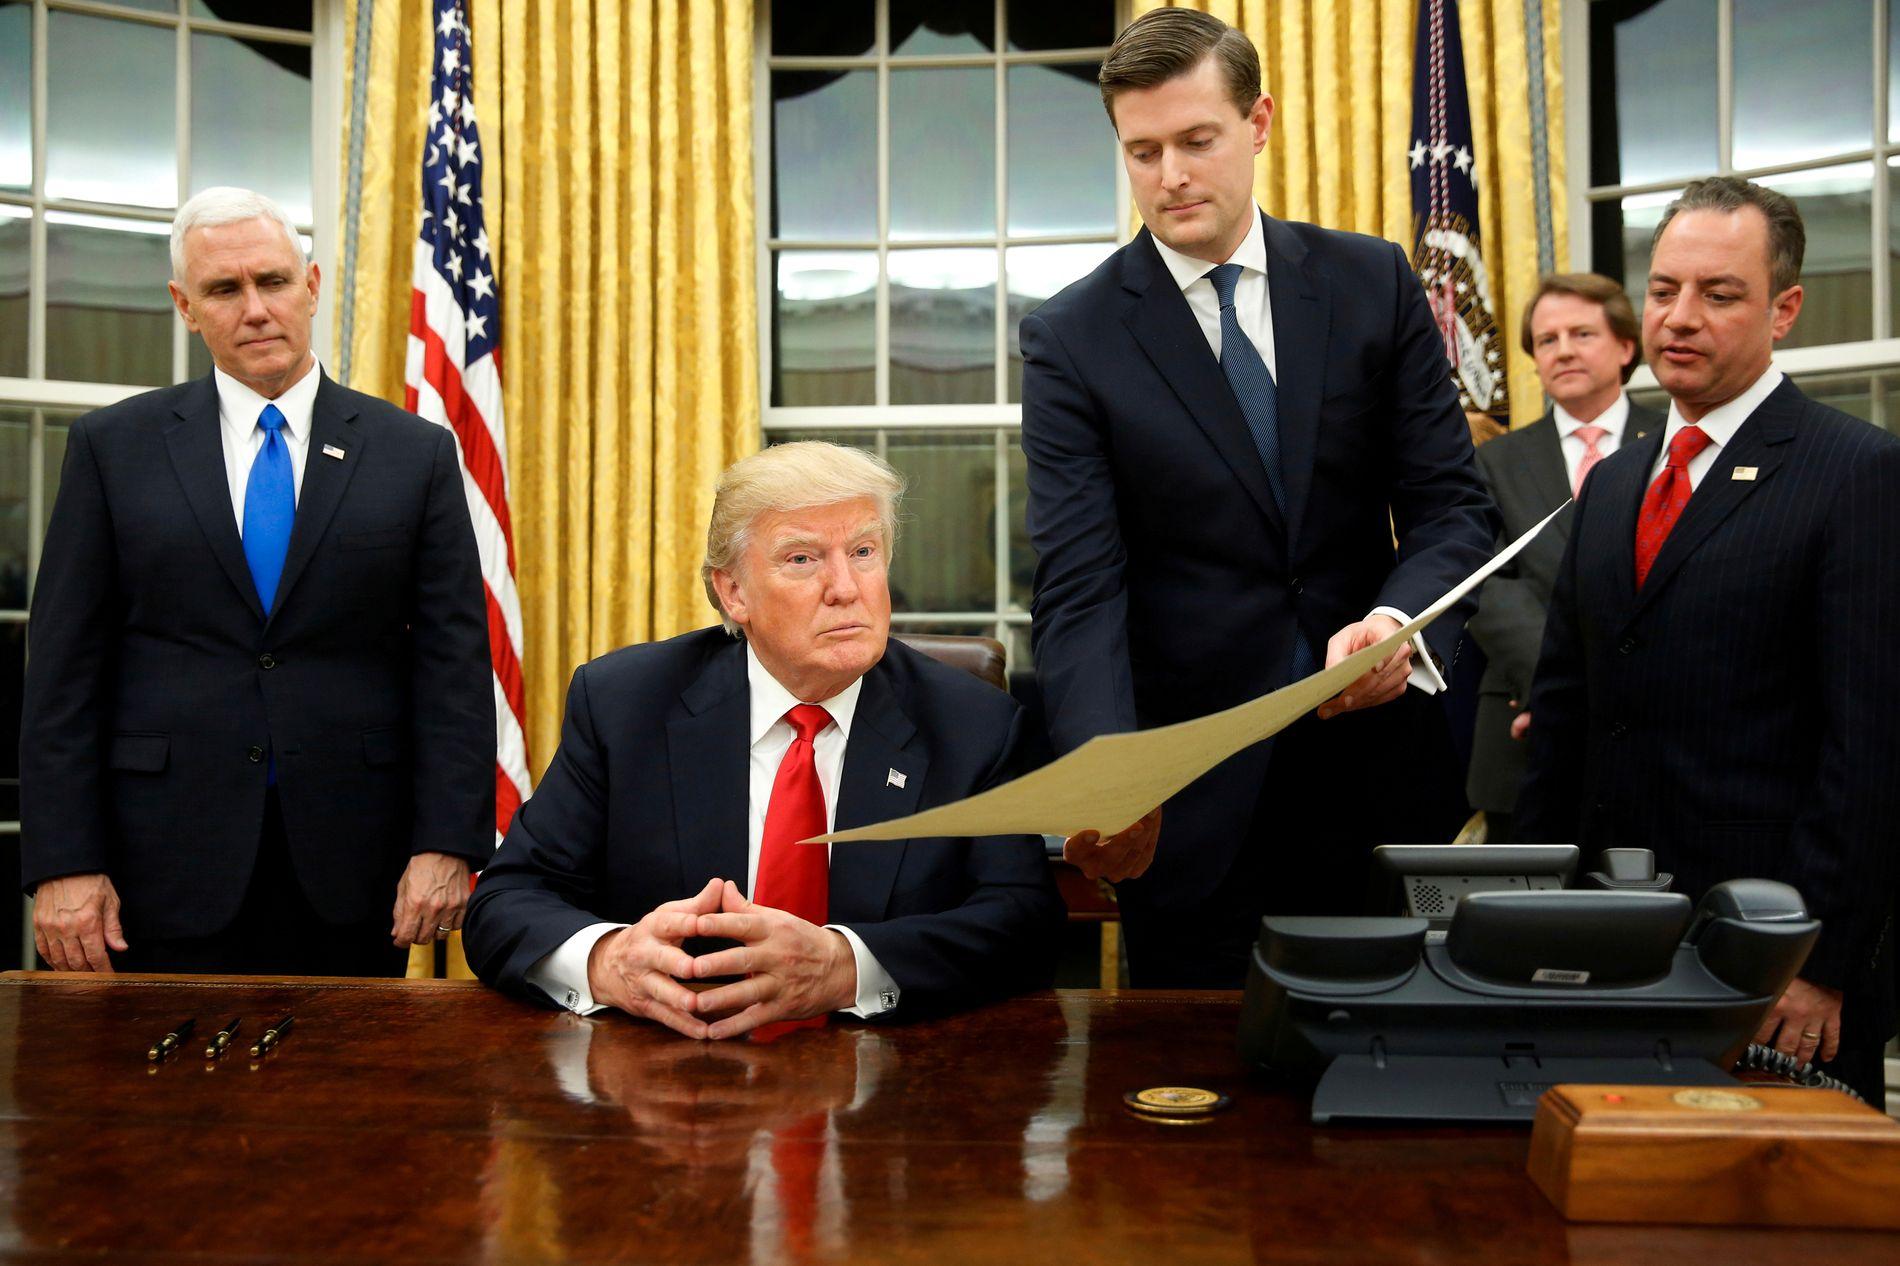 I DET OVALE KONTOR: Robert Porter viser frem et dokument til president Donald Trump. Tidligere stabssjef Reince Priebus til høyre i bildet og visepresident Mike Pence til venstre.